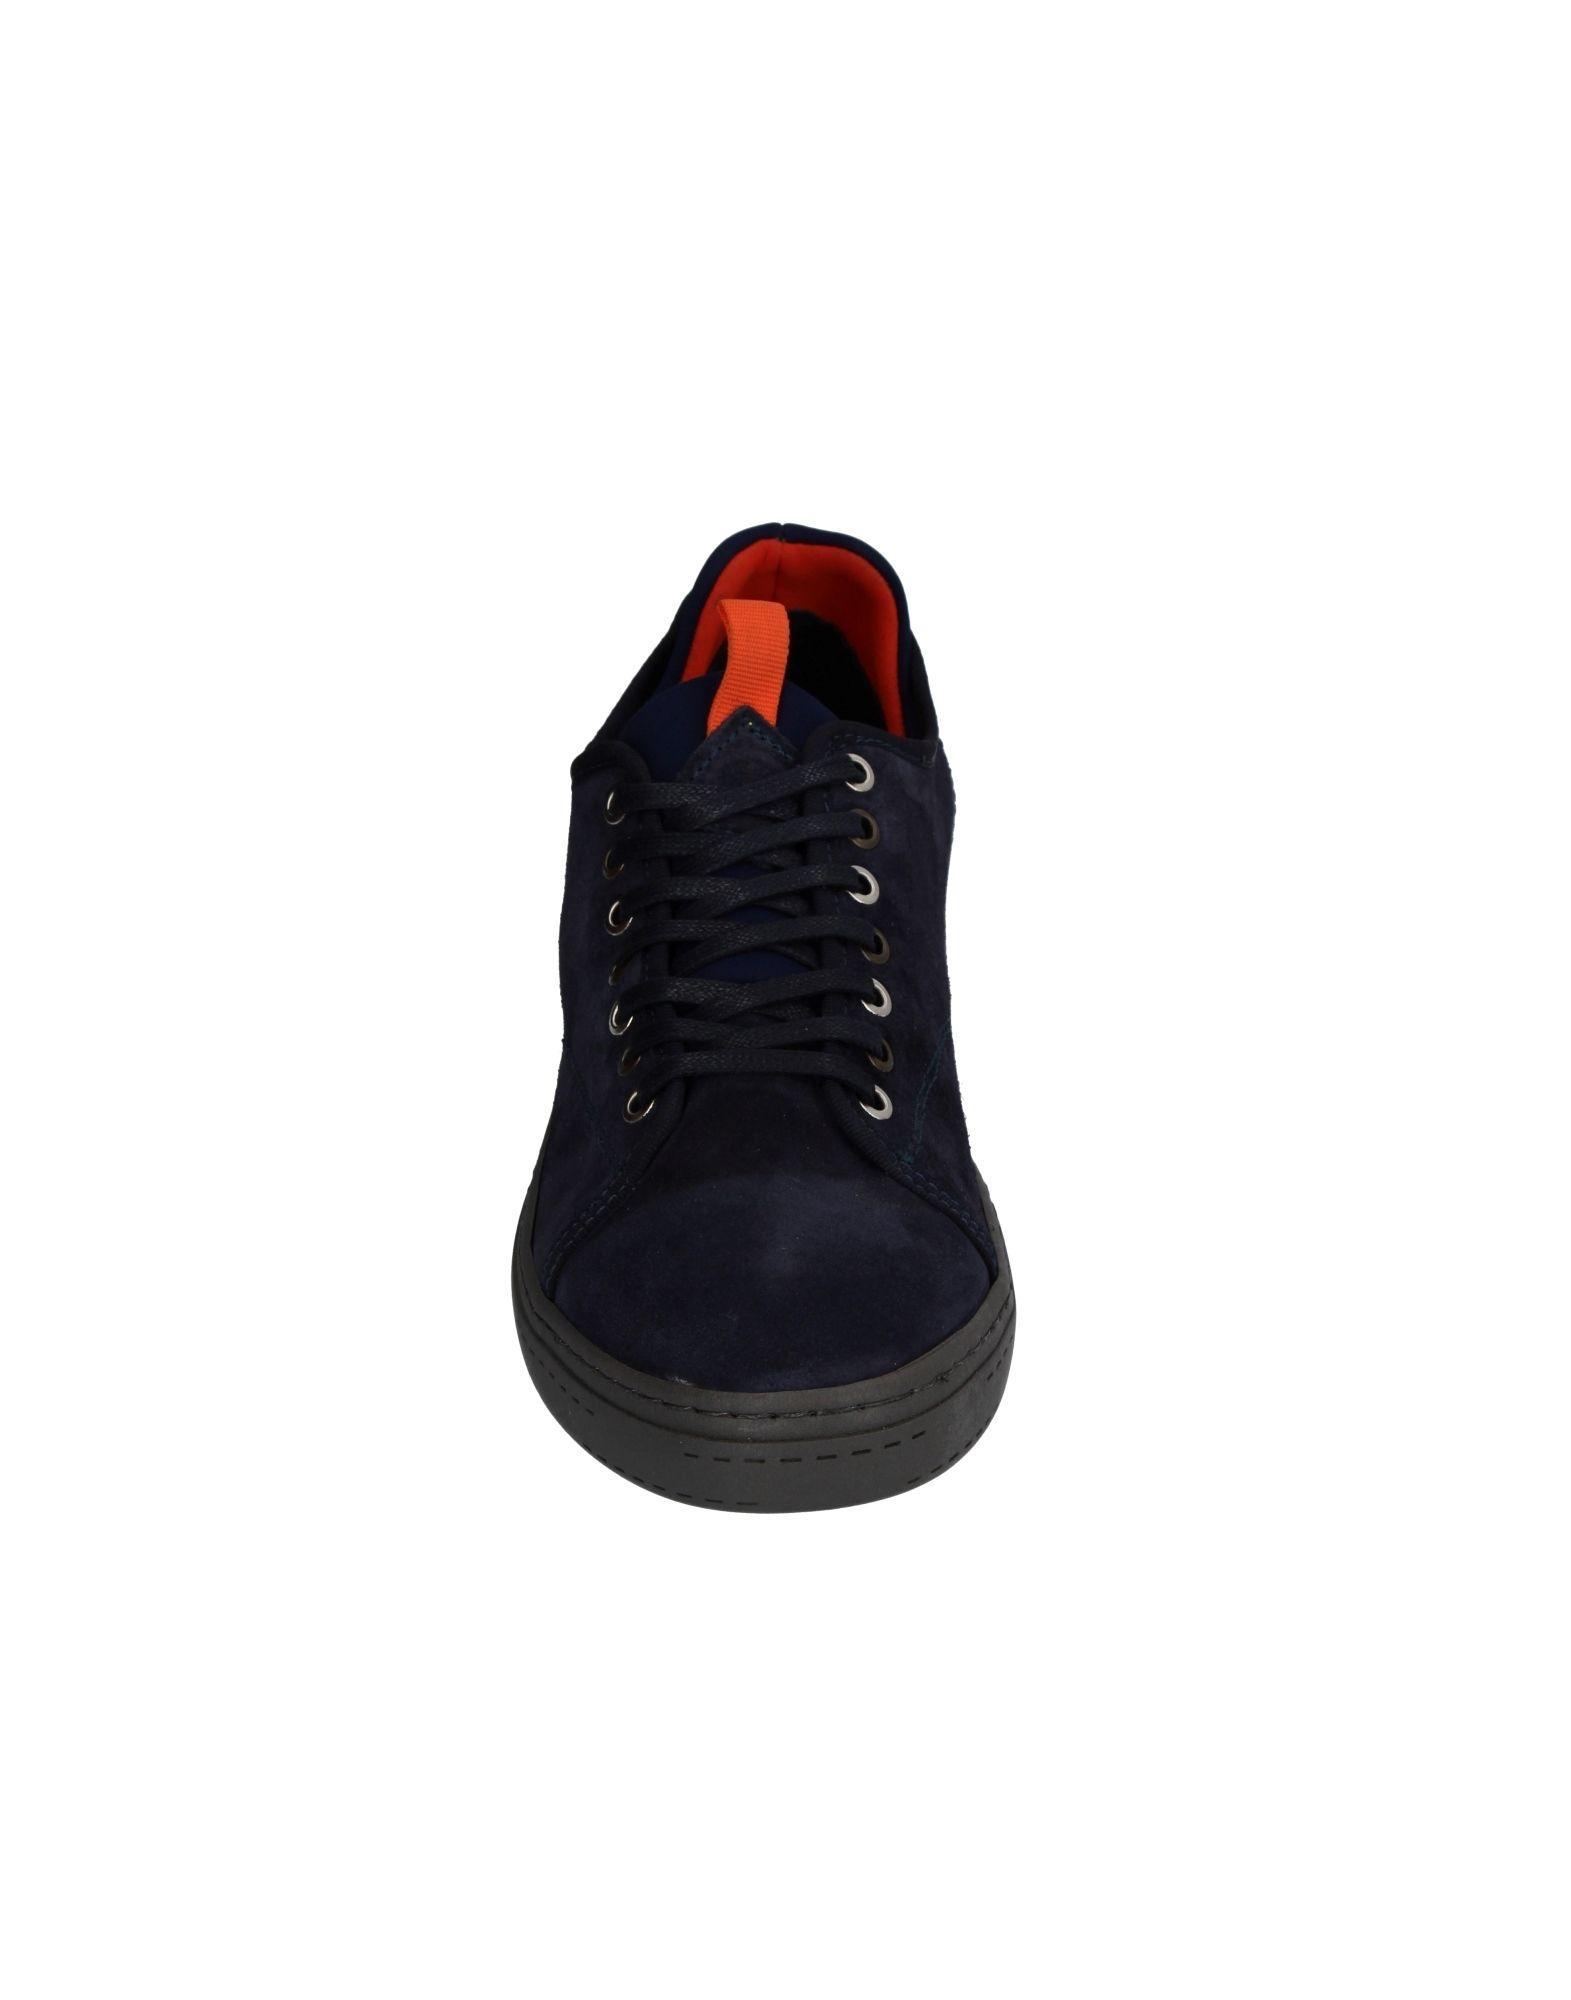 CafeNoir Leather Low-tops & Sneakers in Dark Blue (Black) for Men